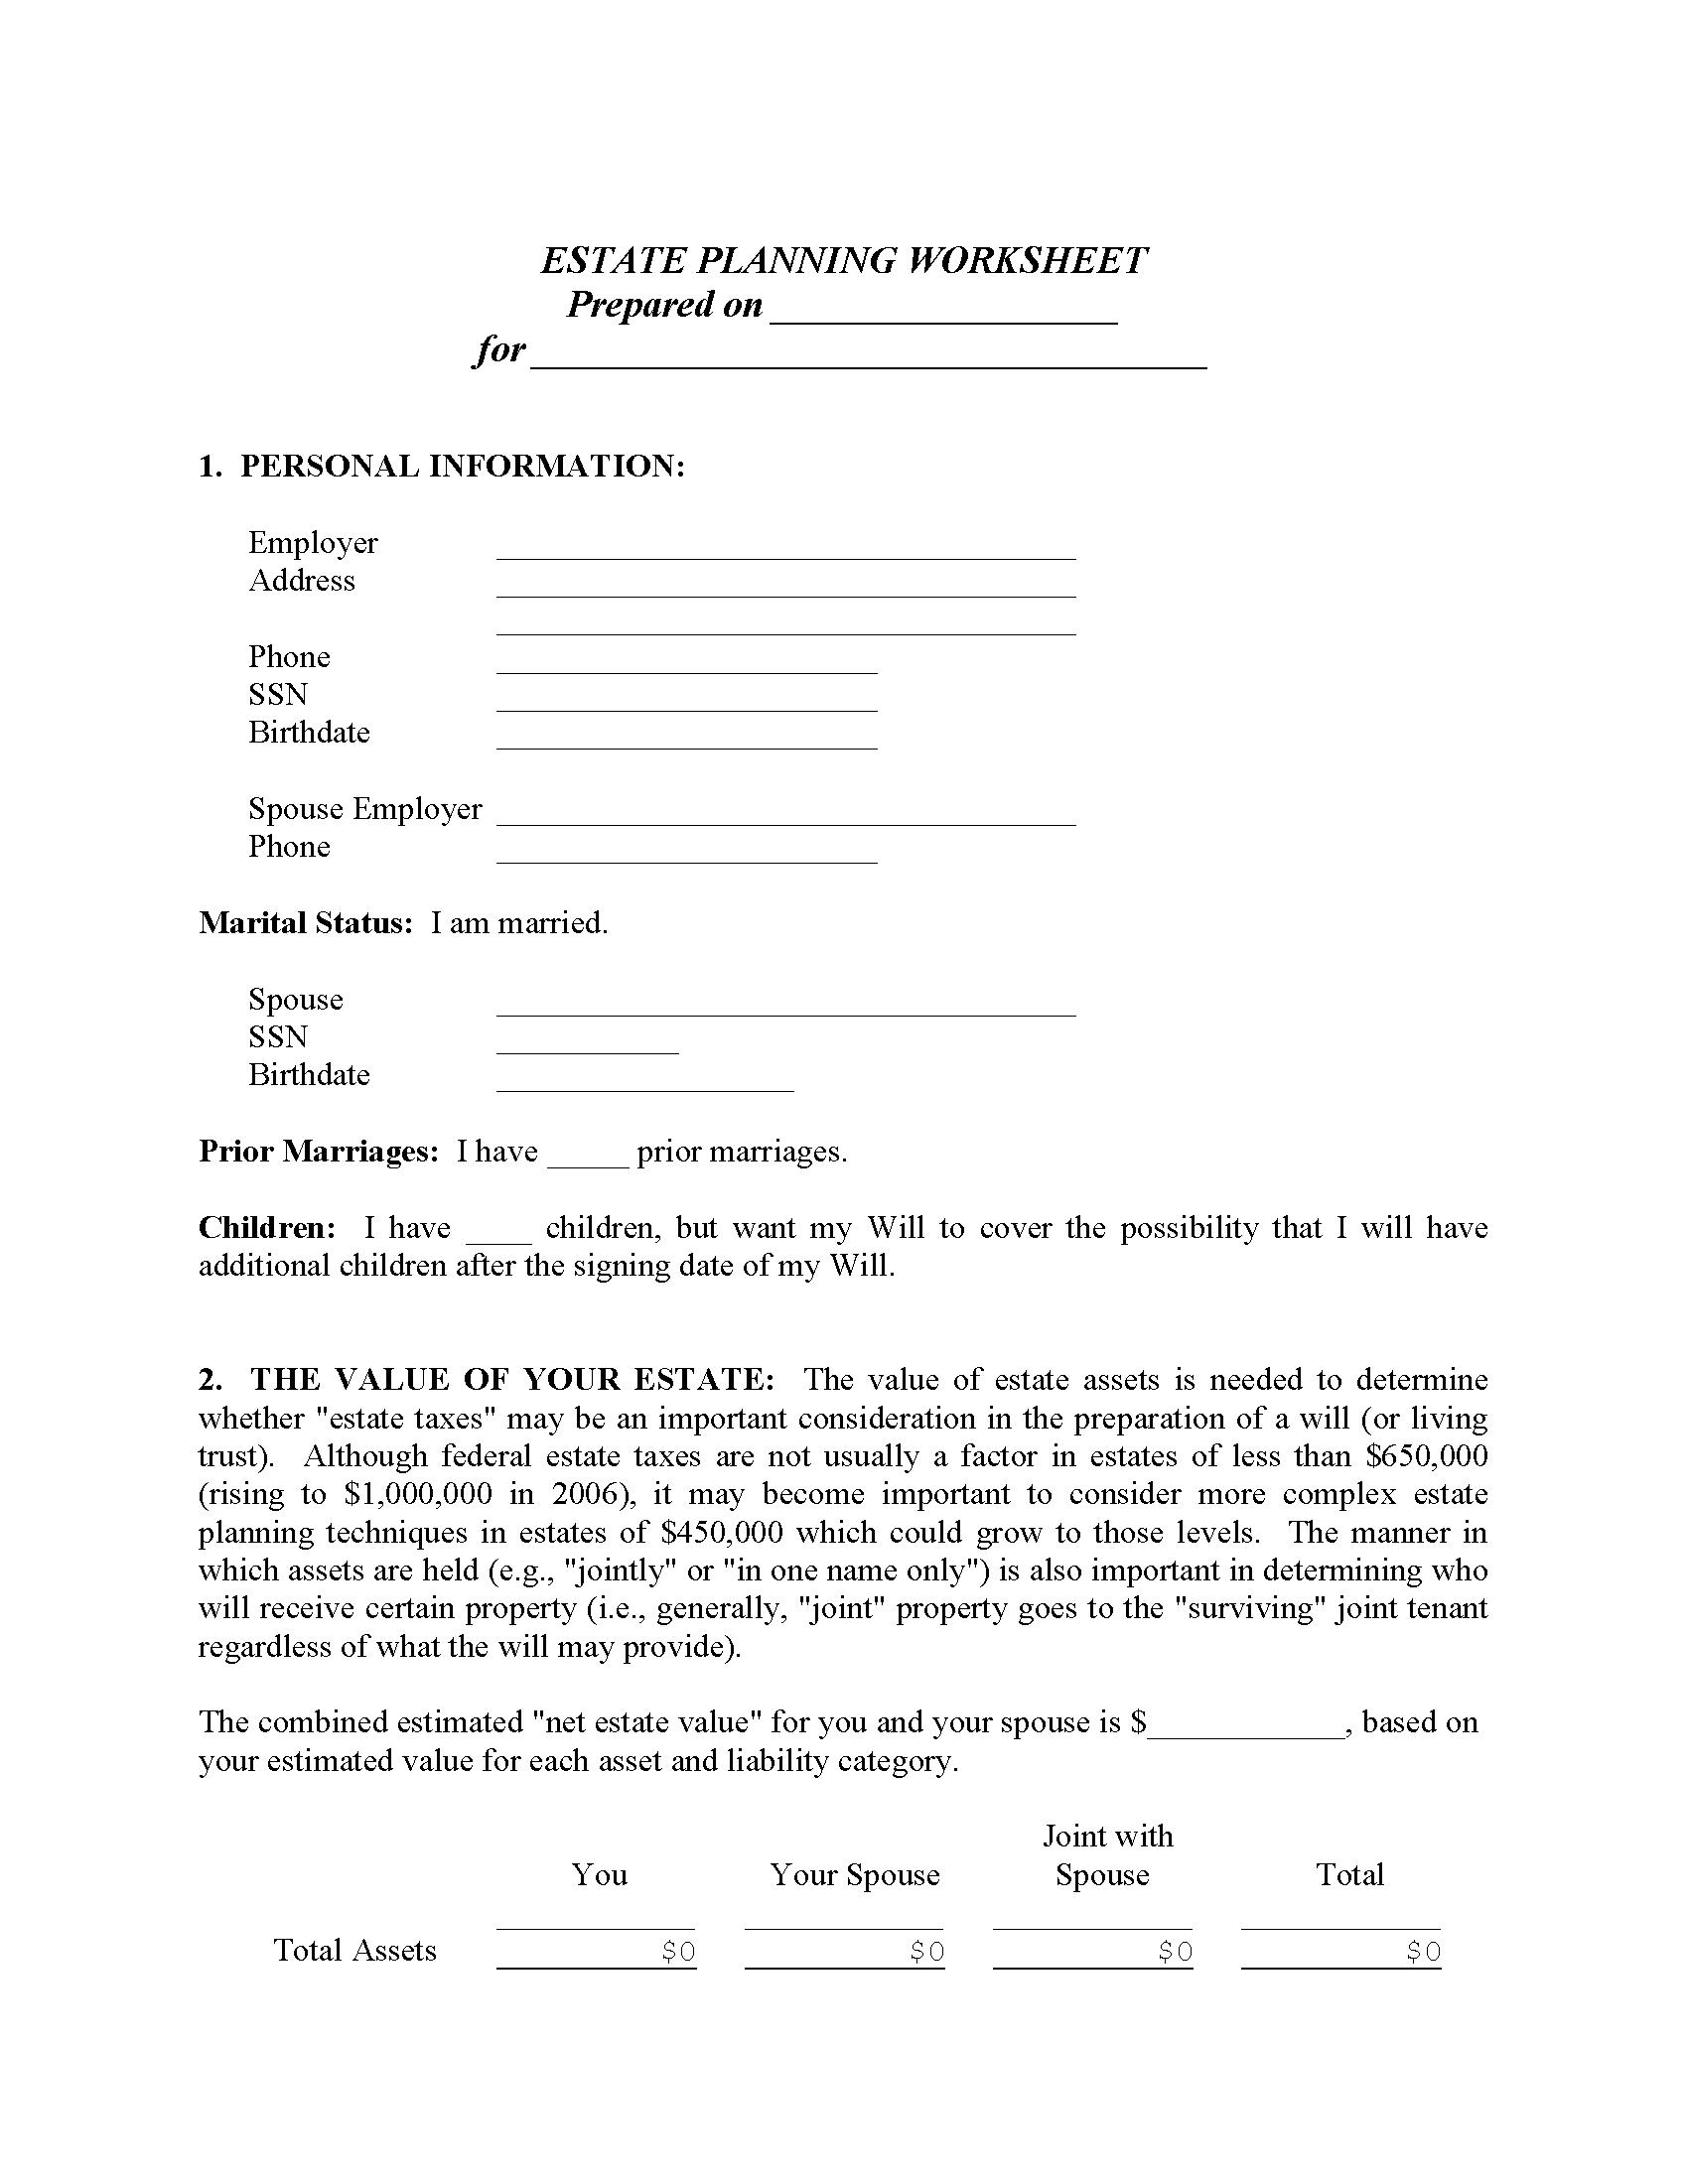 Estate Planning Form - Married